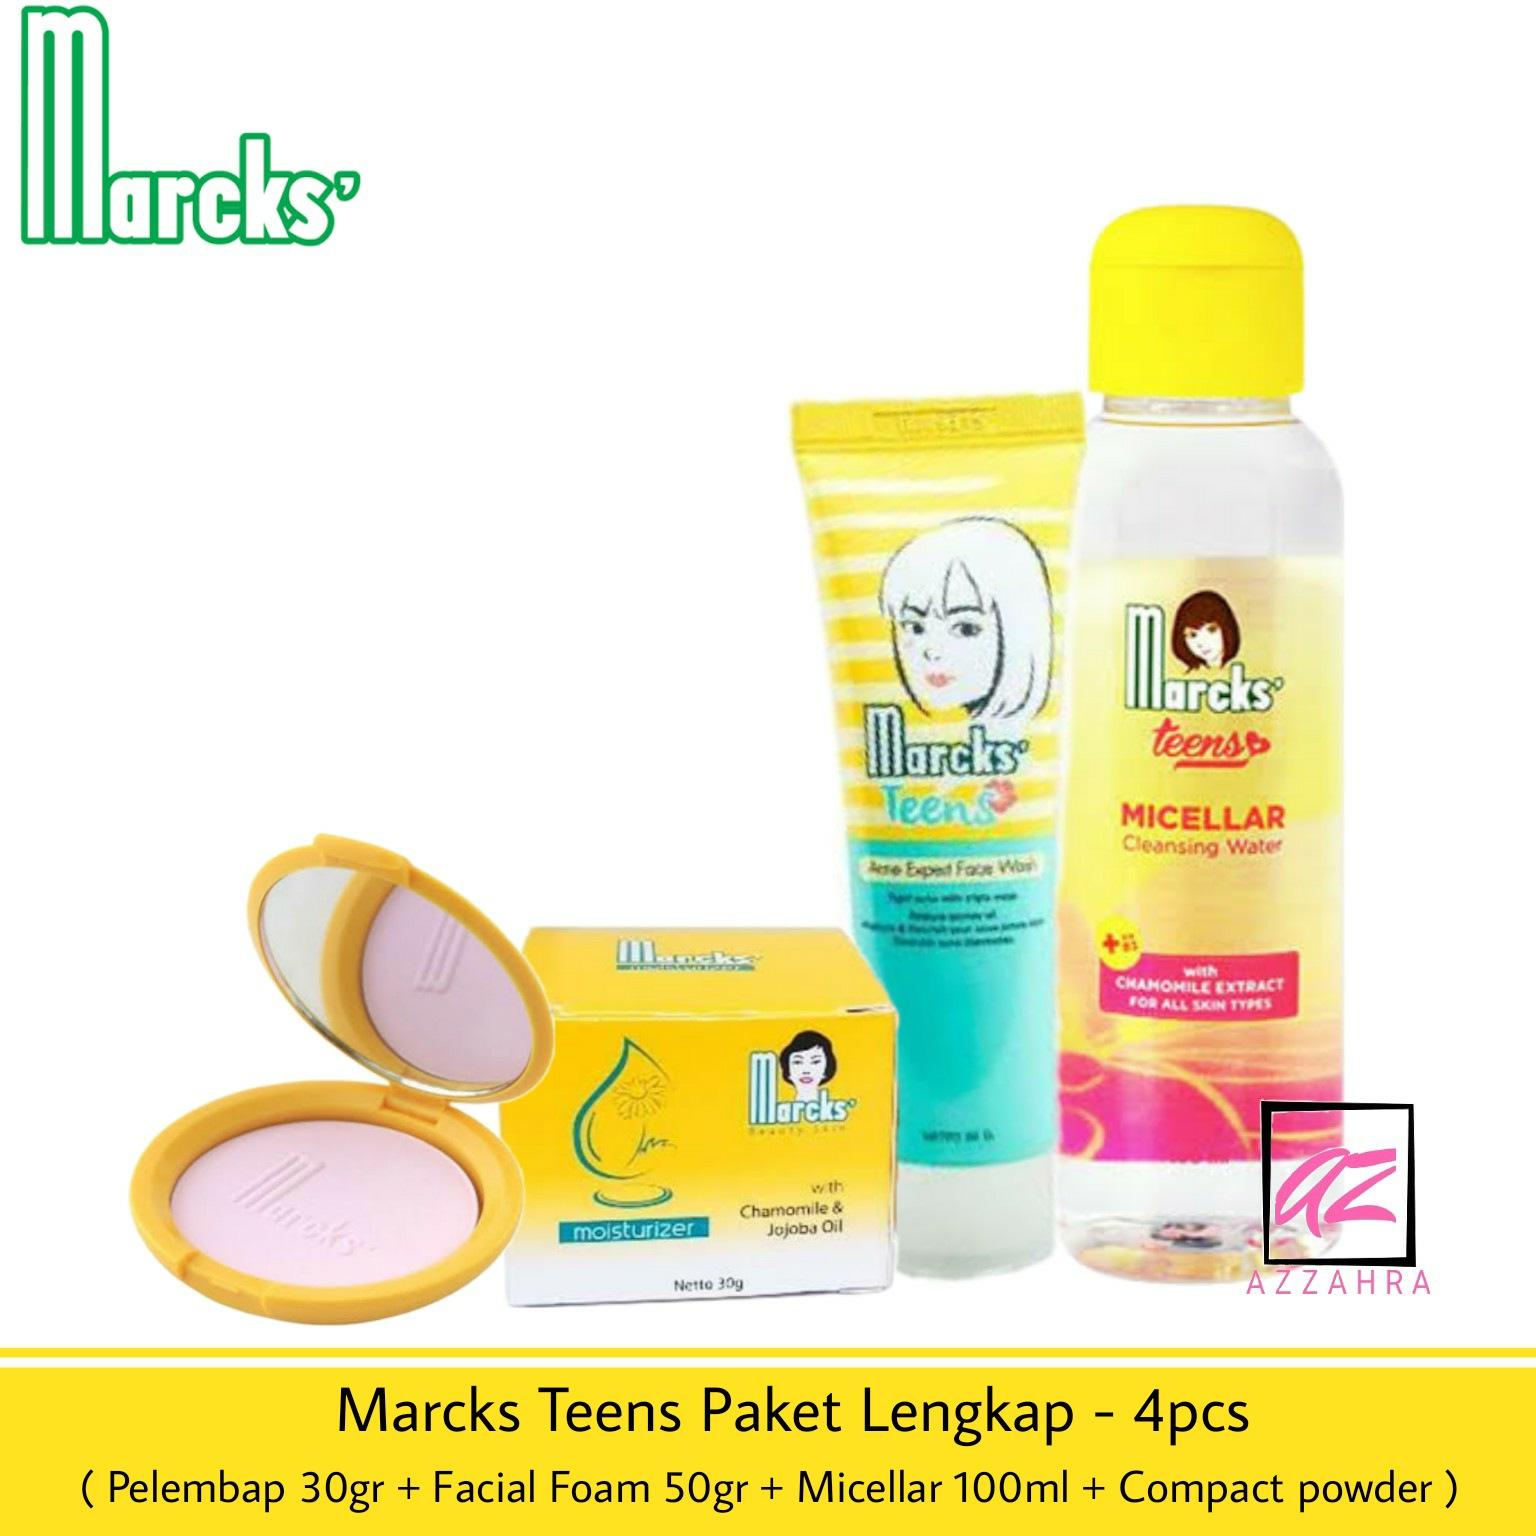 marcks teens paket  – 4pcs ( foam 50gr + pelembap 30gr + micellar 100ml + compact powder )